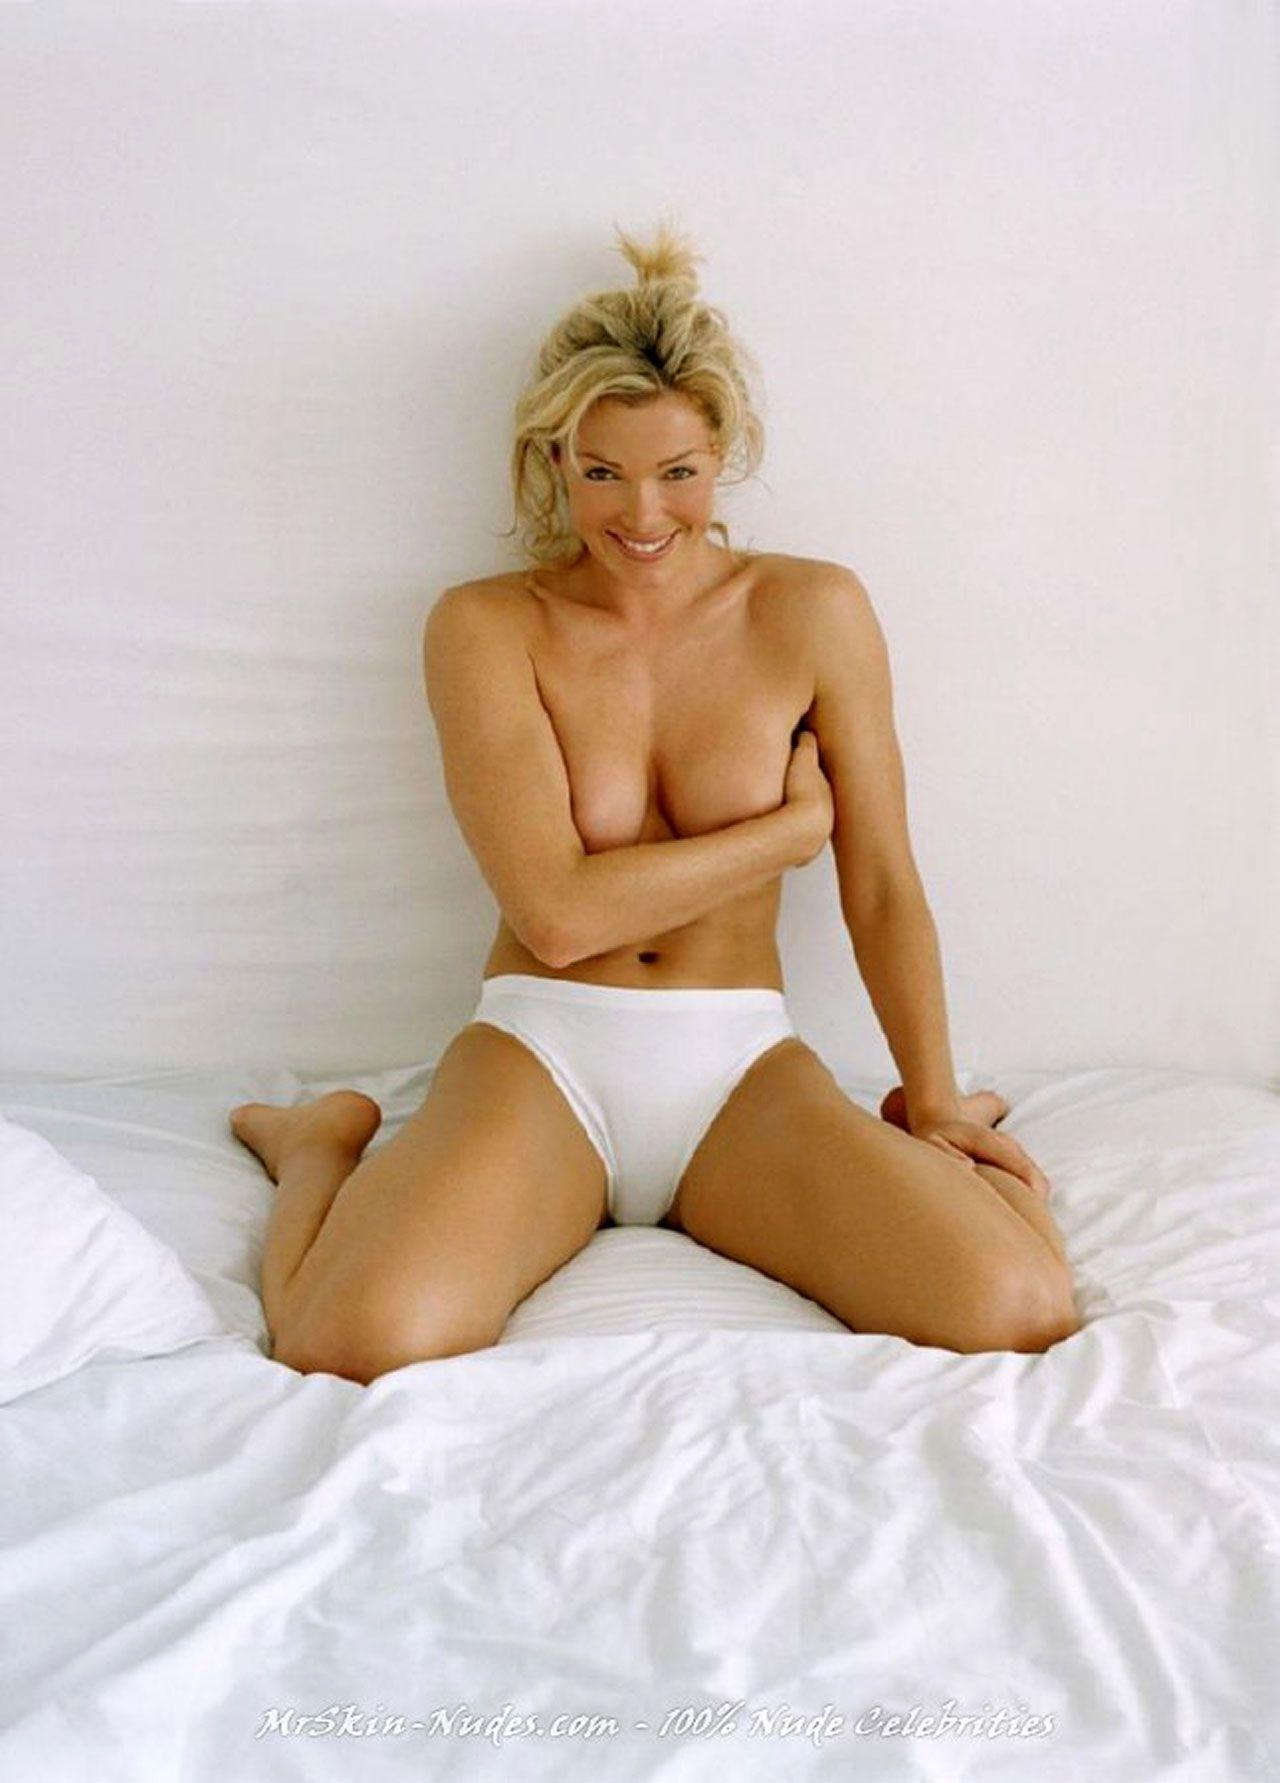 Elsa hosk nude 2,Candice swanepoel sexy 27 Photos XXX pic Abigale Mandler,WTF Hanna Beth